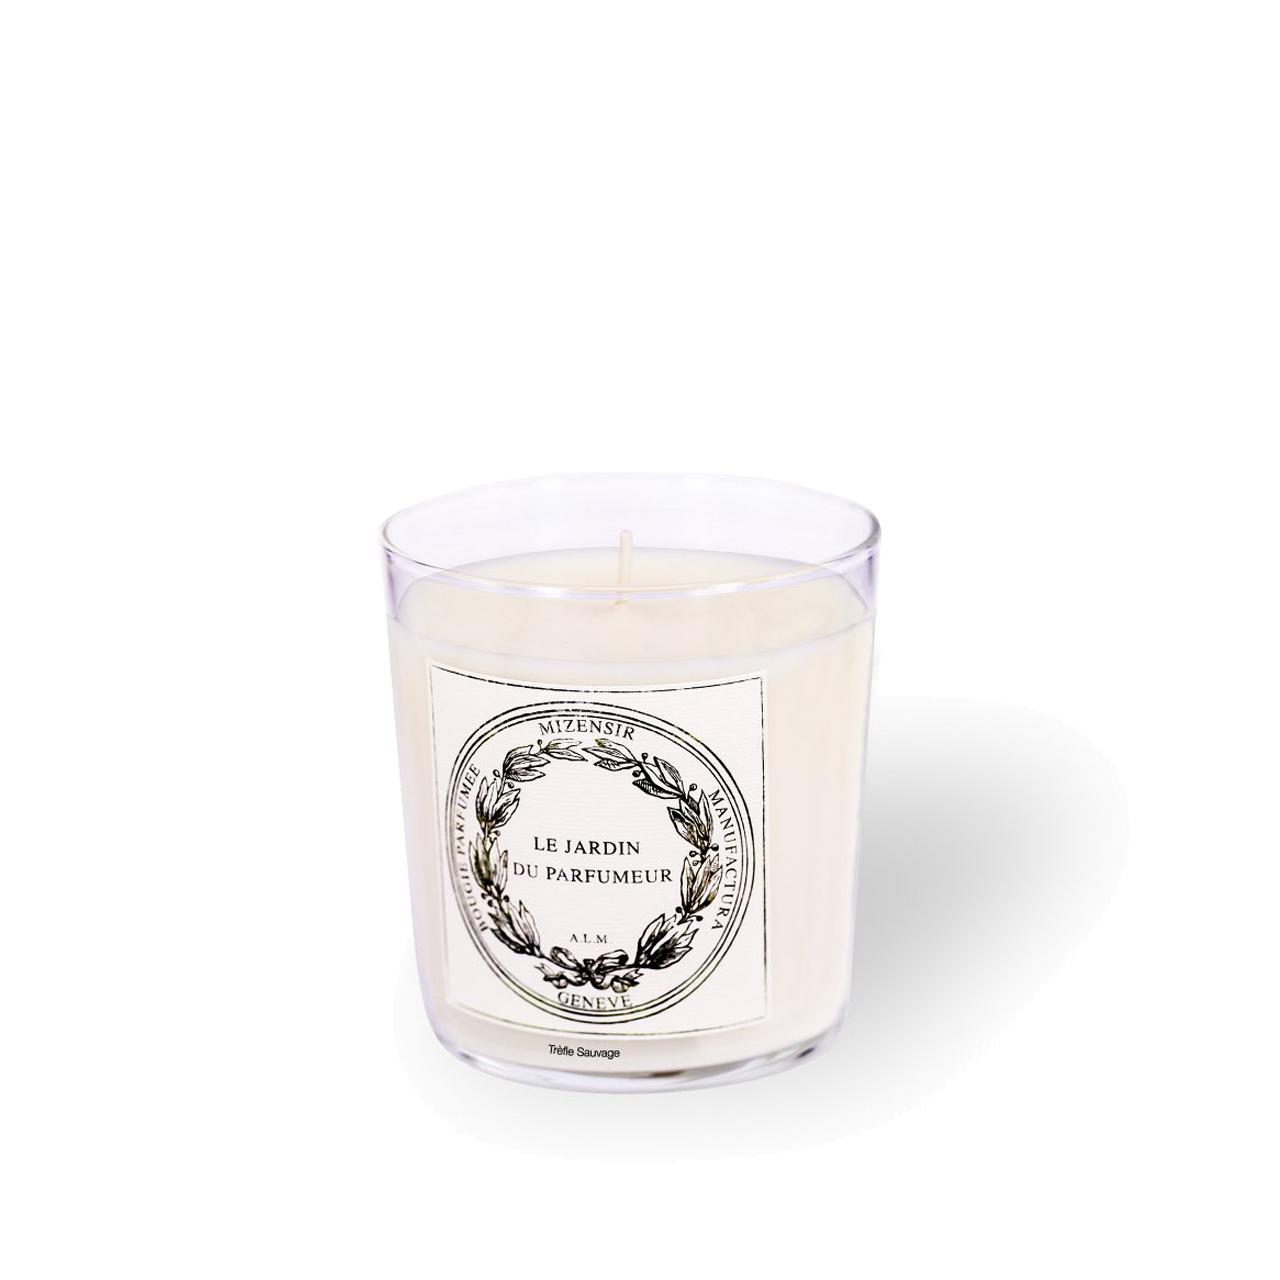 Trèfle Sauvage - Candle